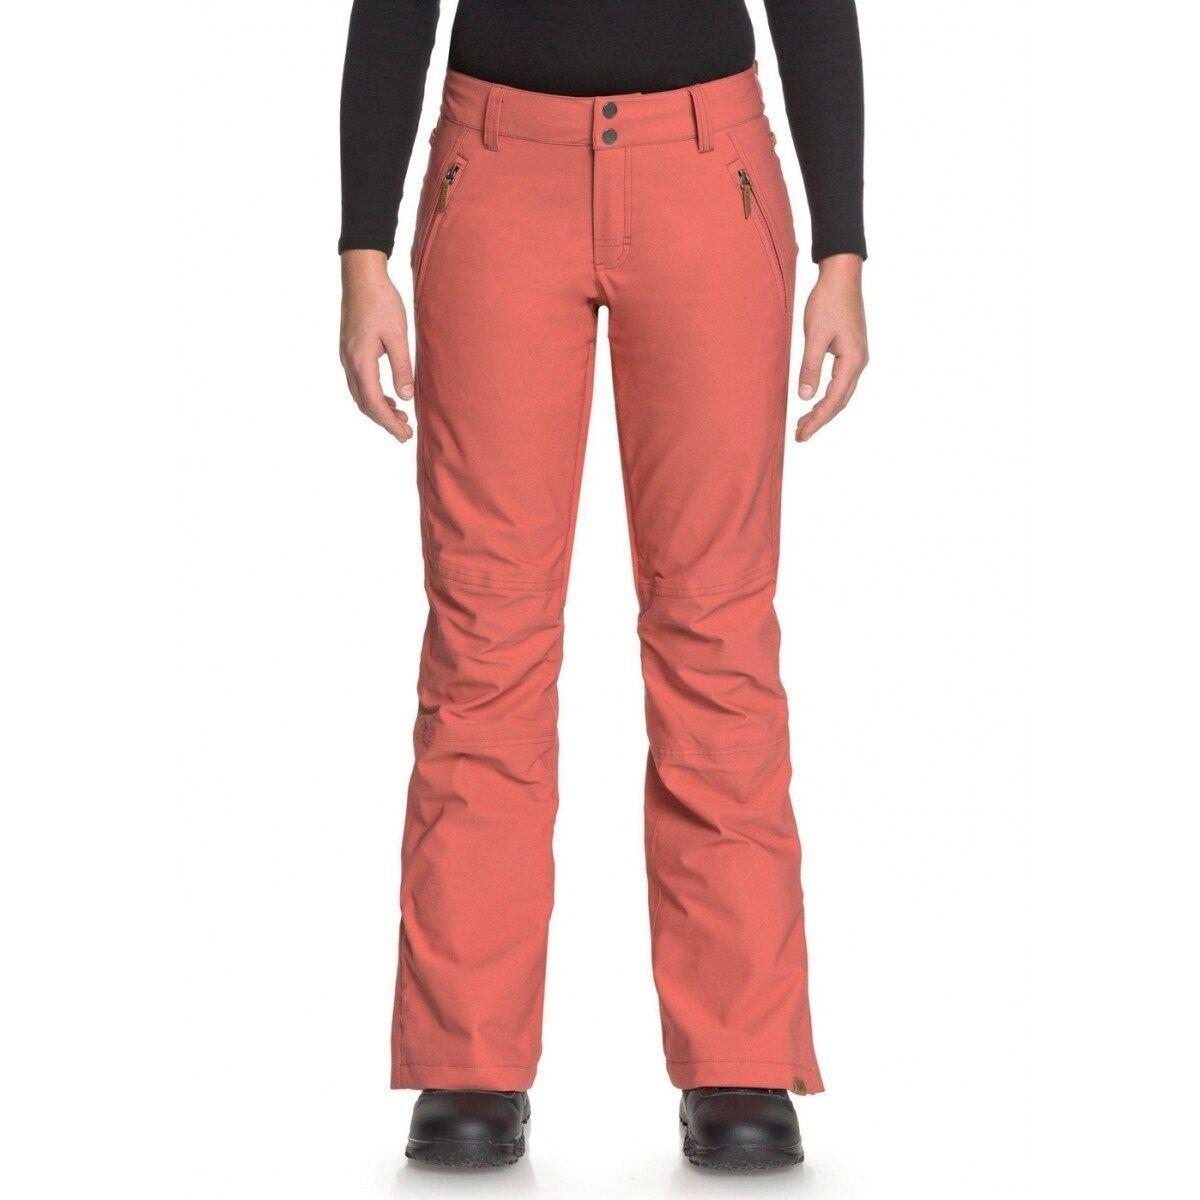 ROXY Women's CABIN Snow Pants - MMR0 - Medium - NWT